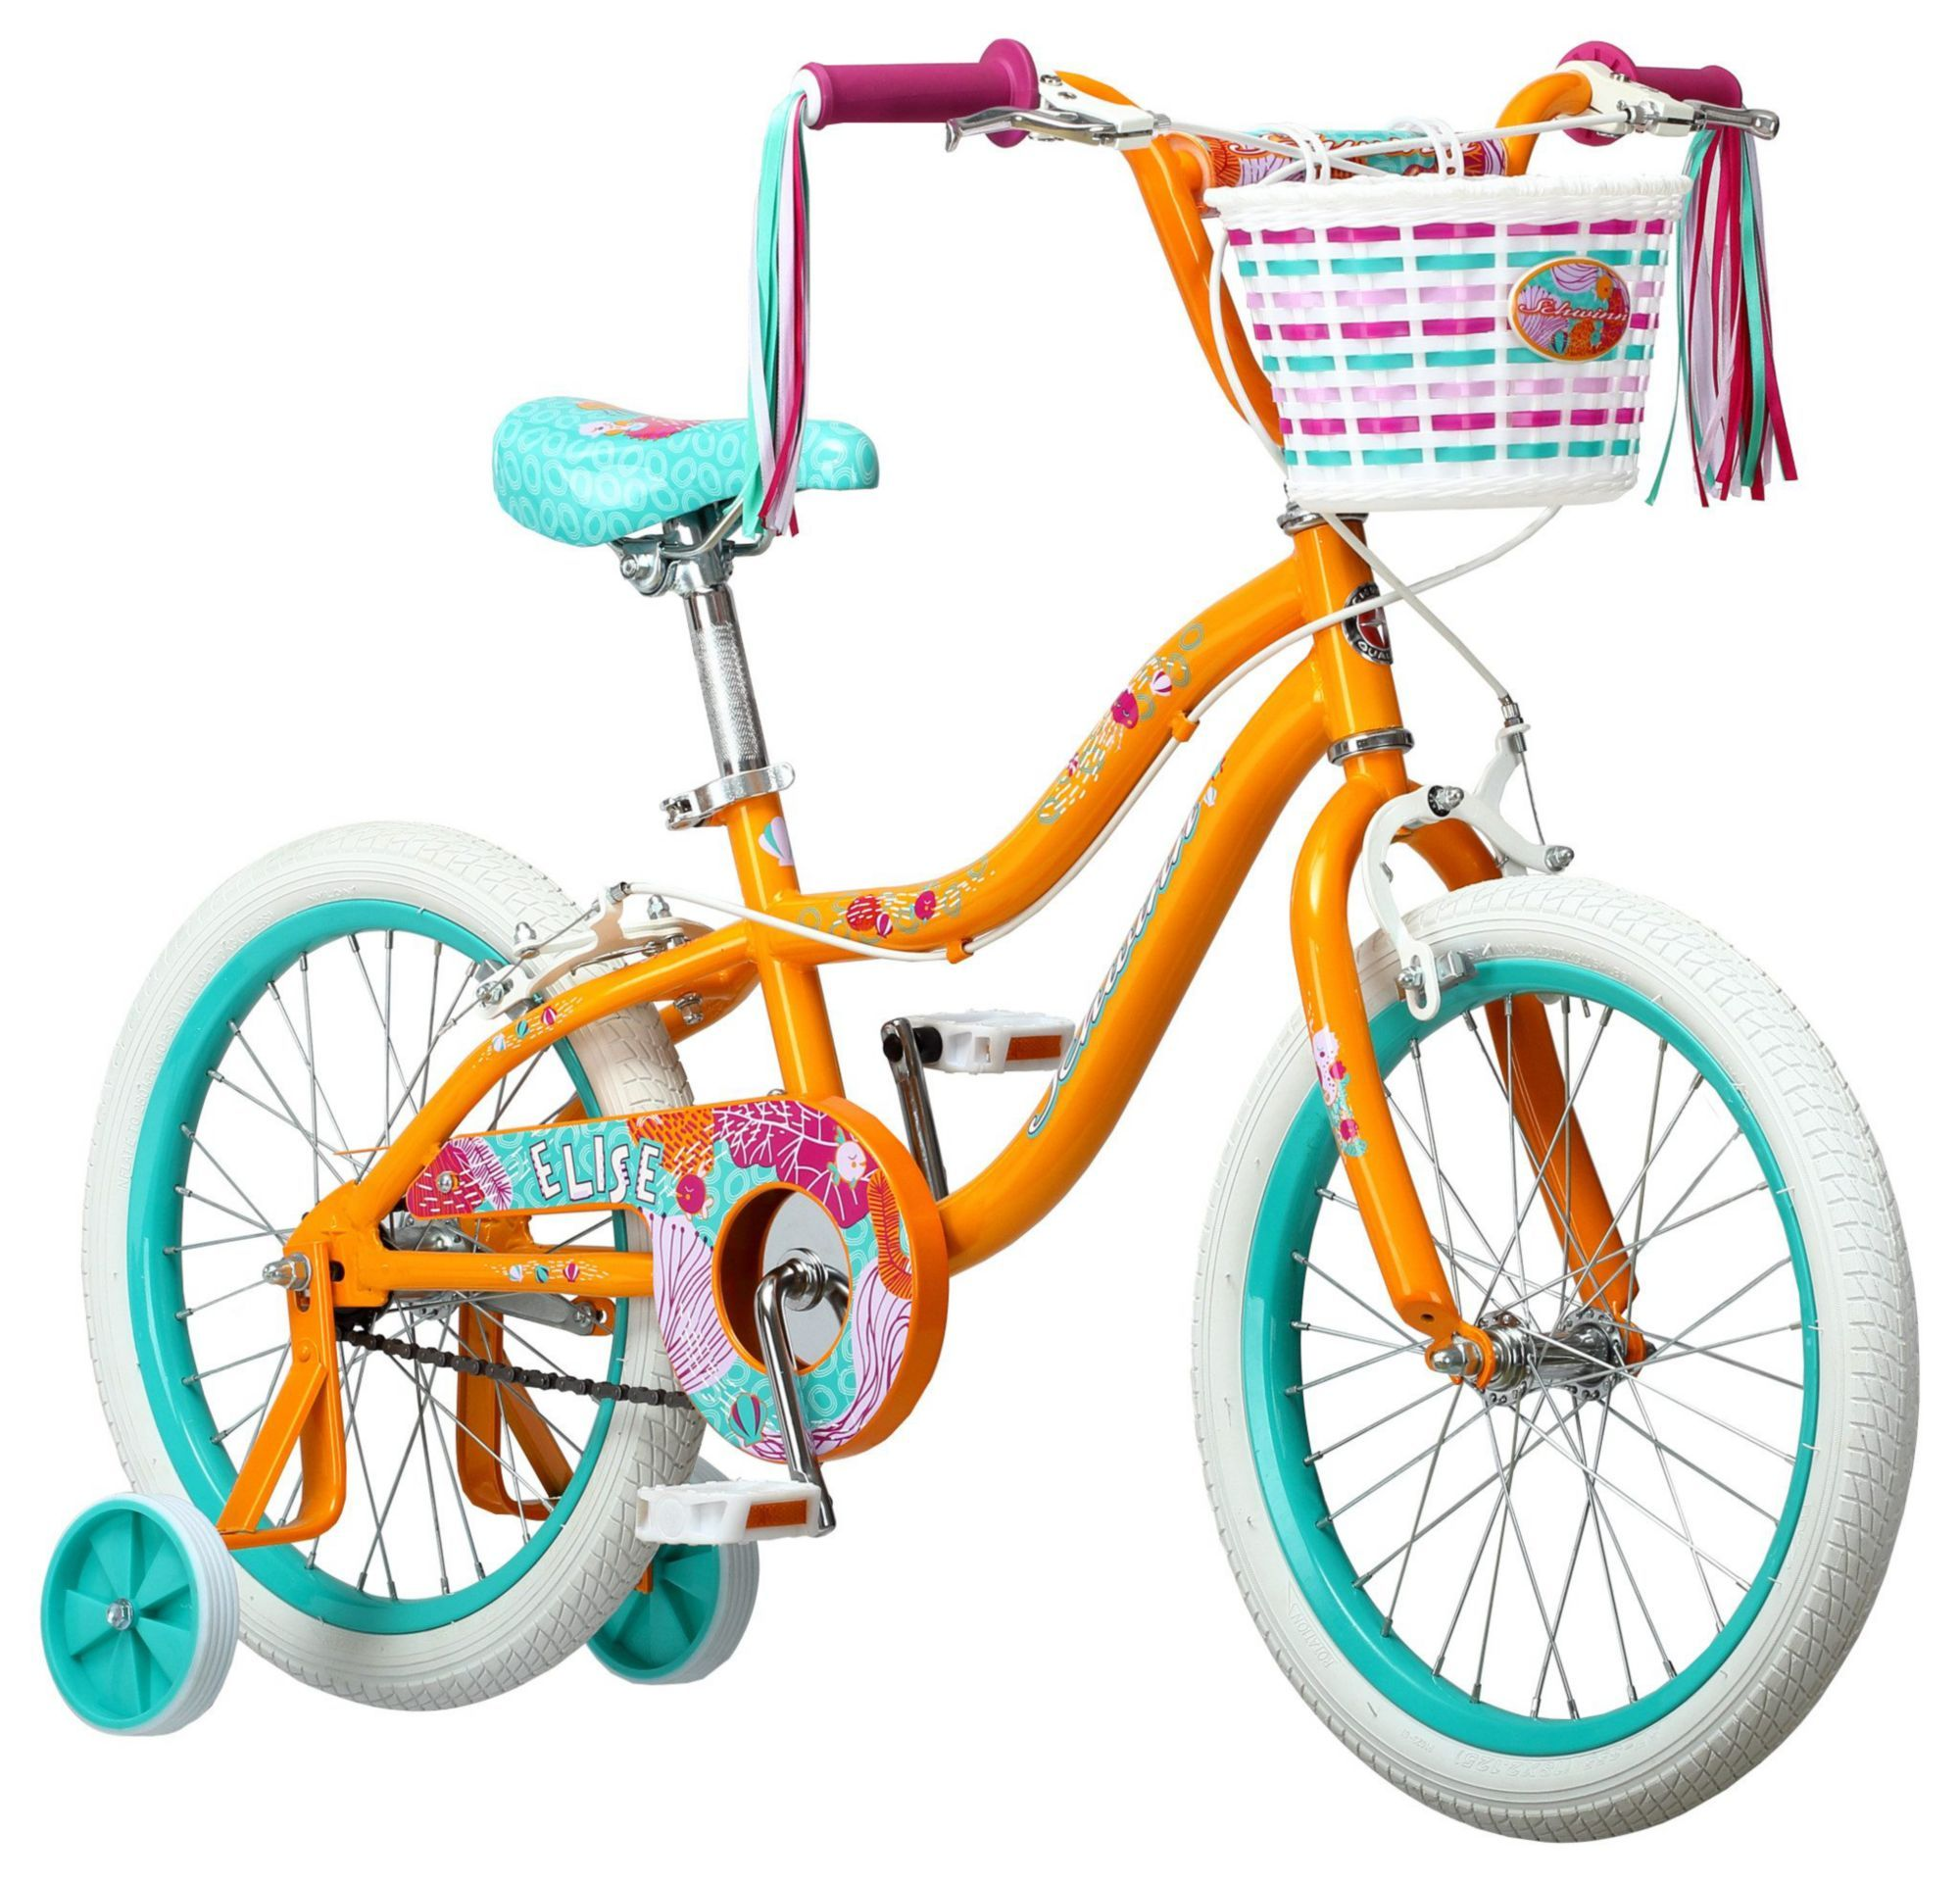 Park Art|My WordPress Blog_Fit Bike Bmx 18 Inch